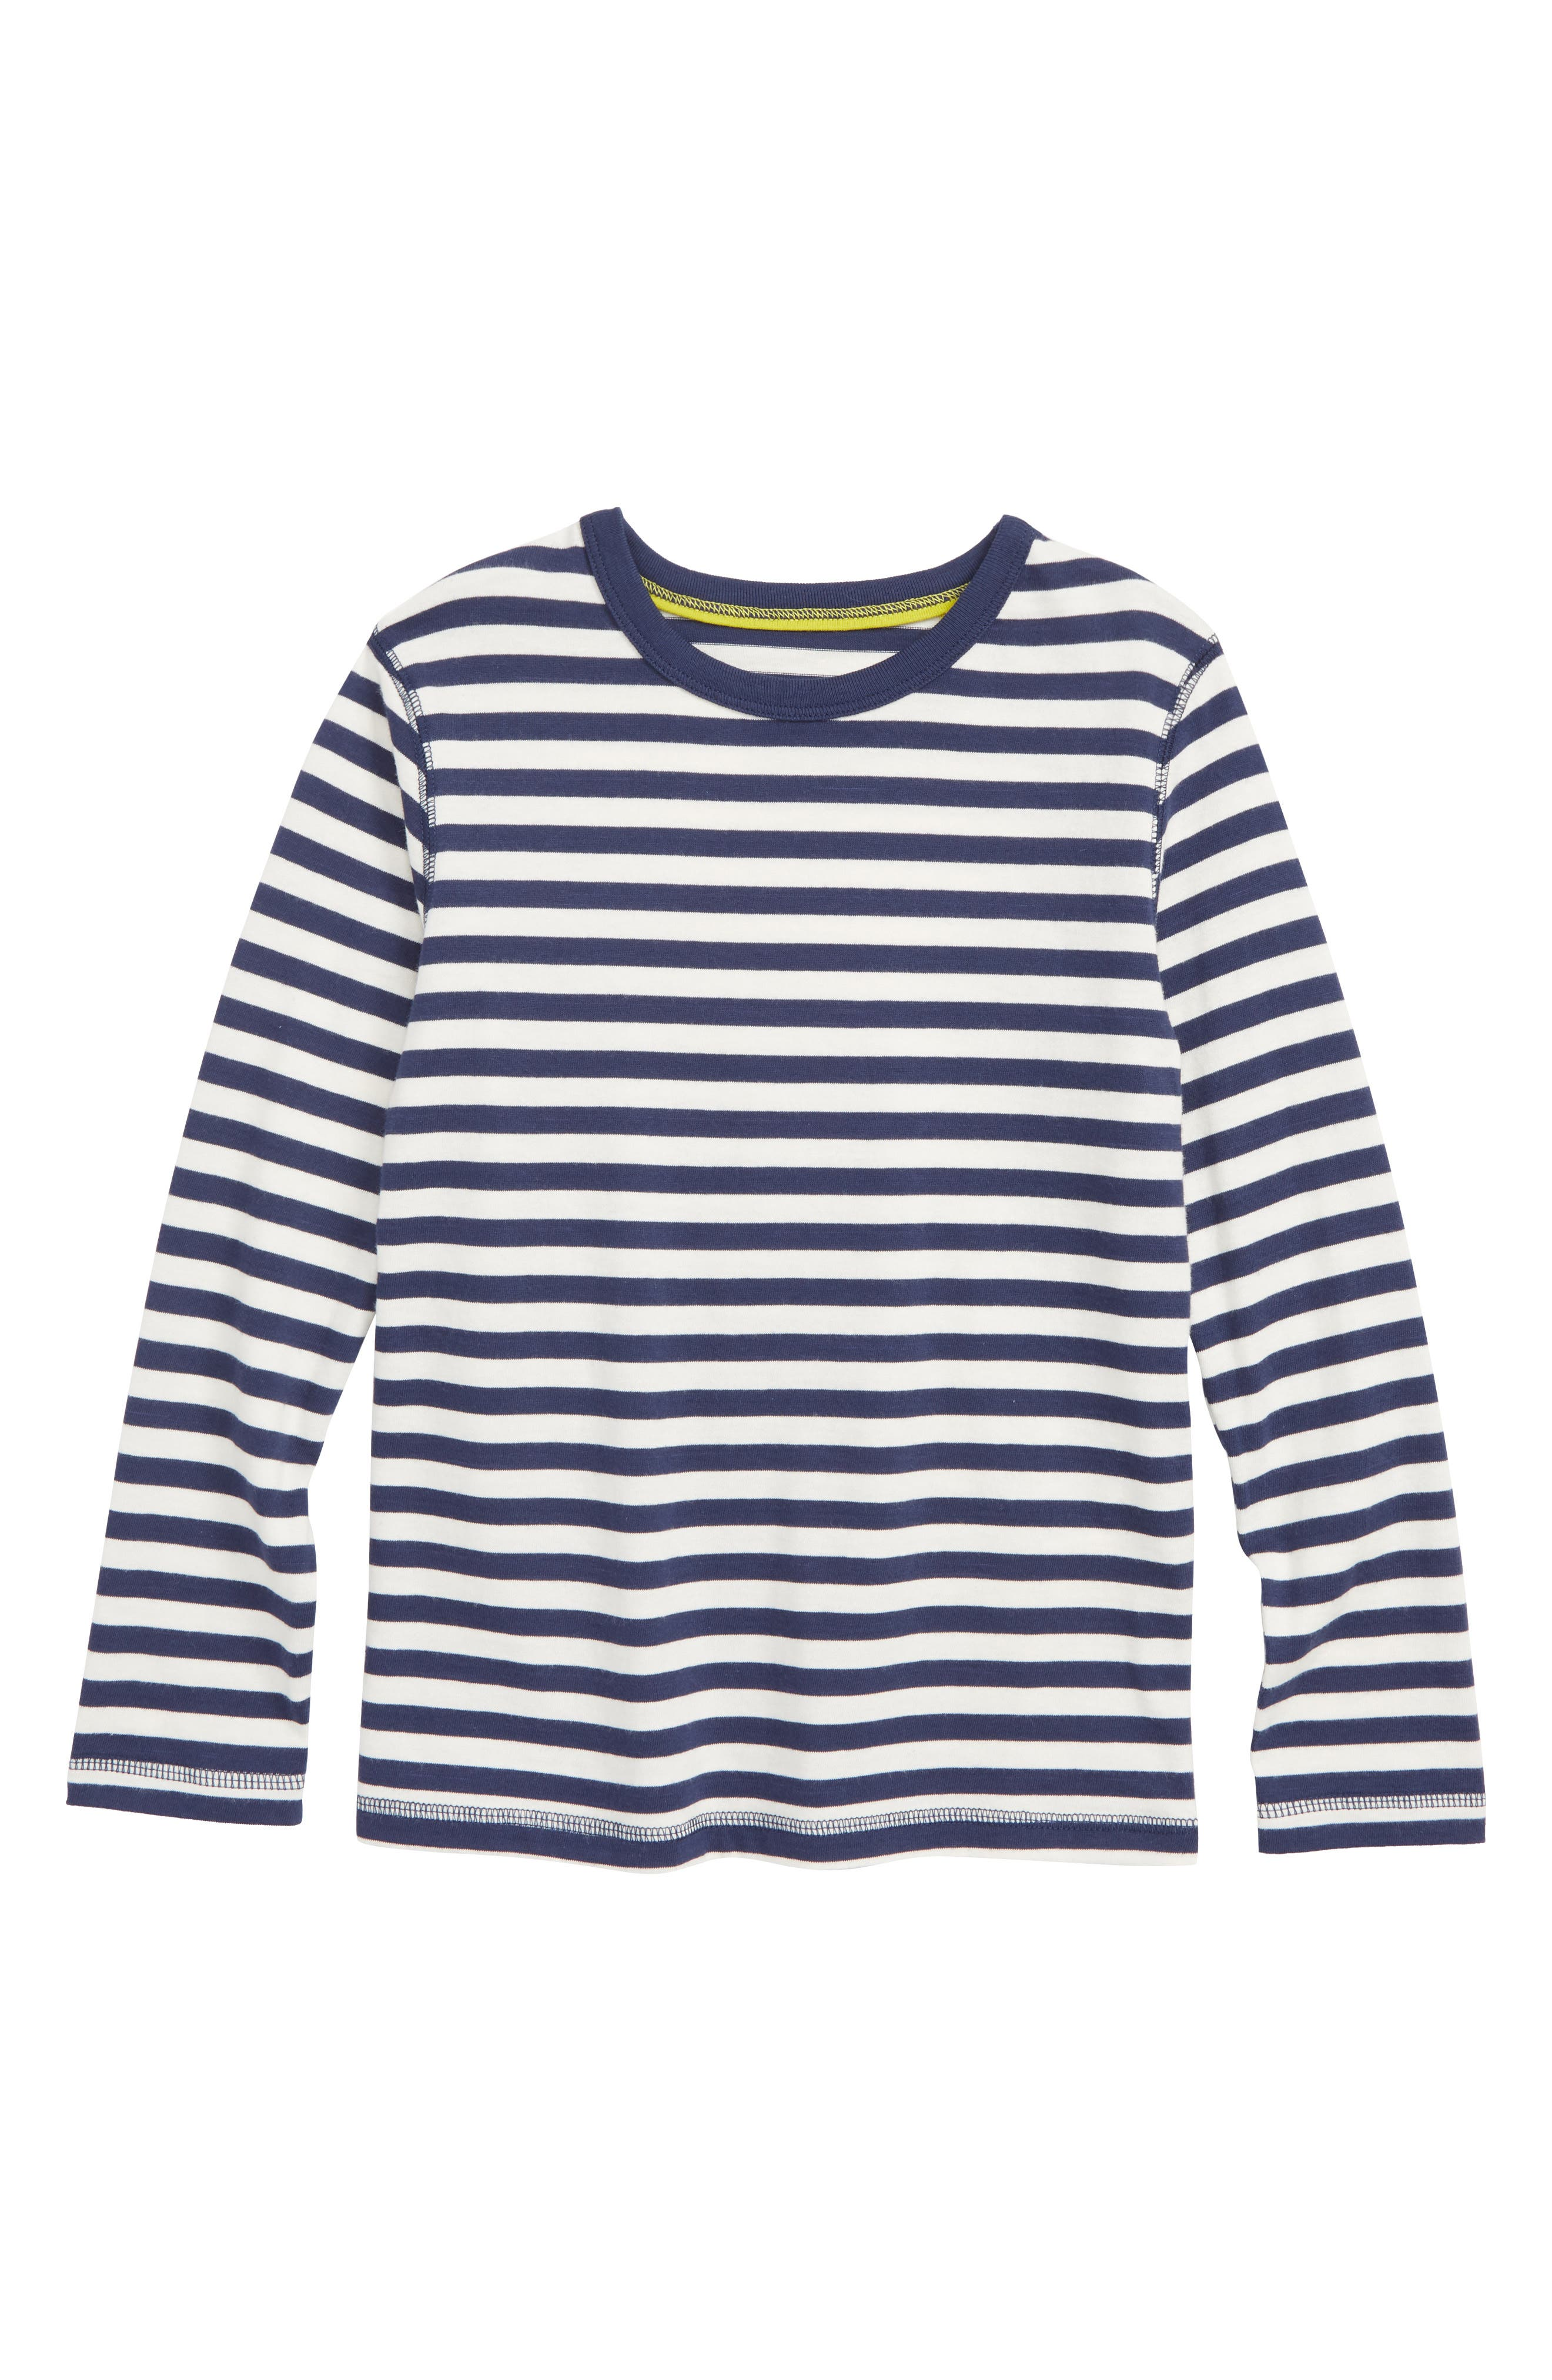 Supersoft Stripe T-Shirt,                         Main,                         color, SCHOOL NAVY/ ECRU